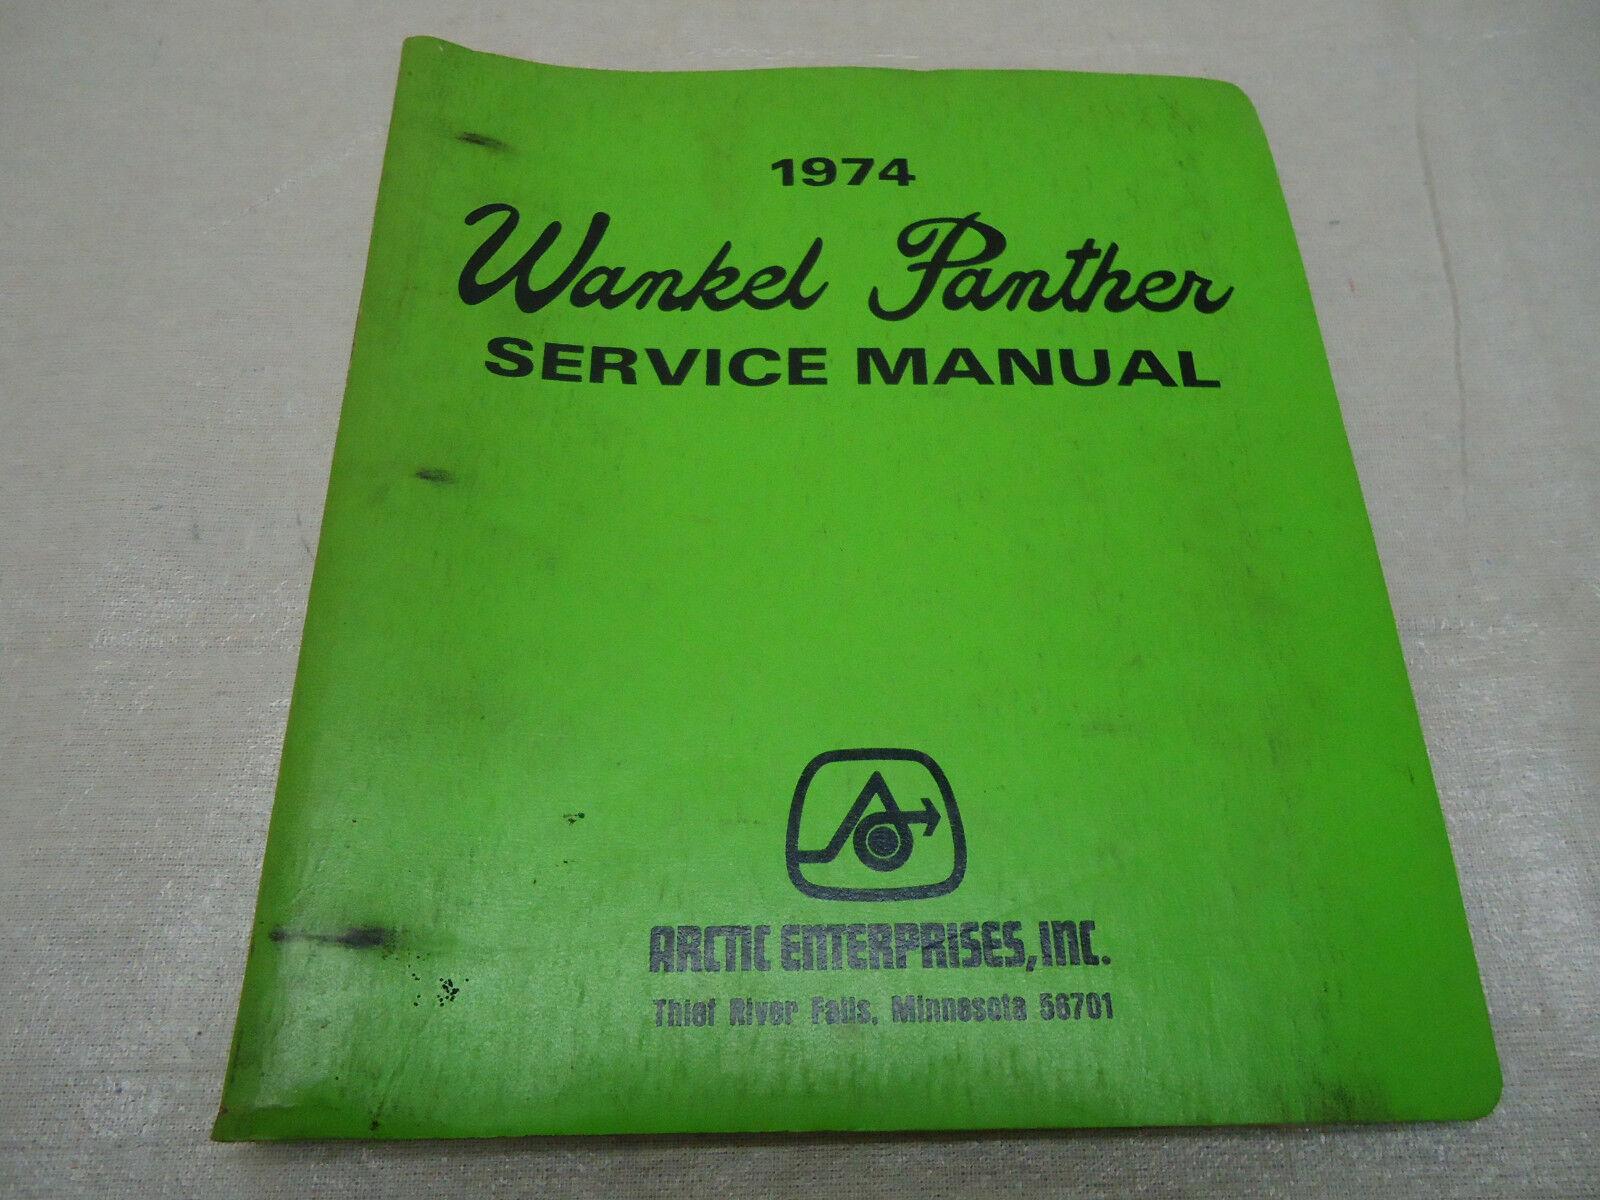 Vintage 1974 Wankel Panther service Manual OEM 0153  030  just for you